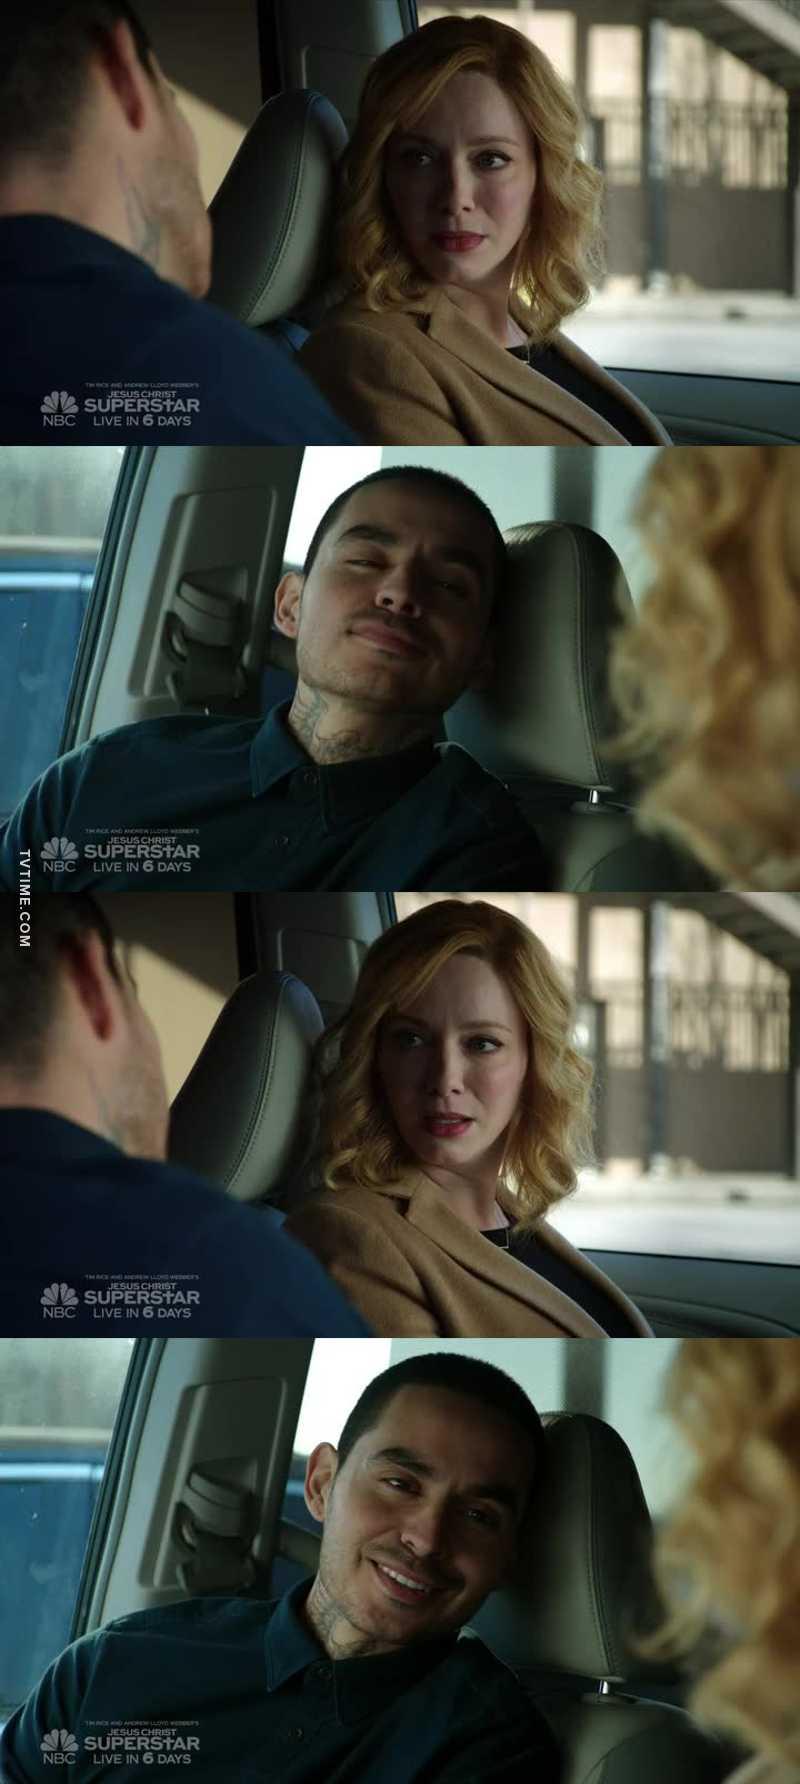 Rio: Diga que estou te comendo Beth: Como é ? Rio: Desculpa baby, fala que estamos fazendo amor